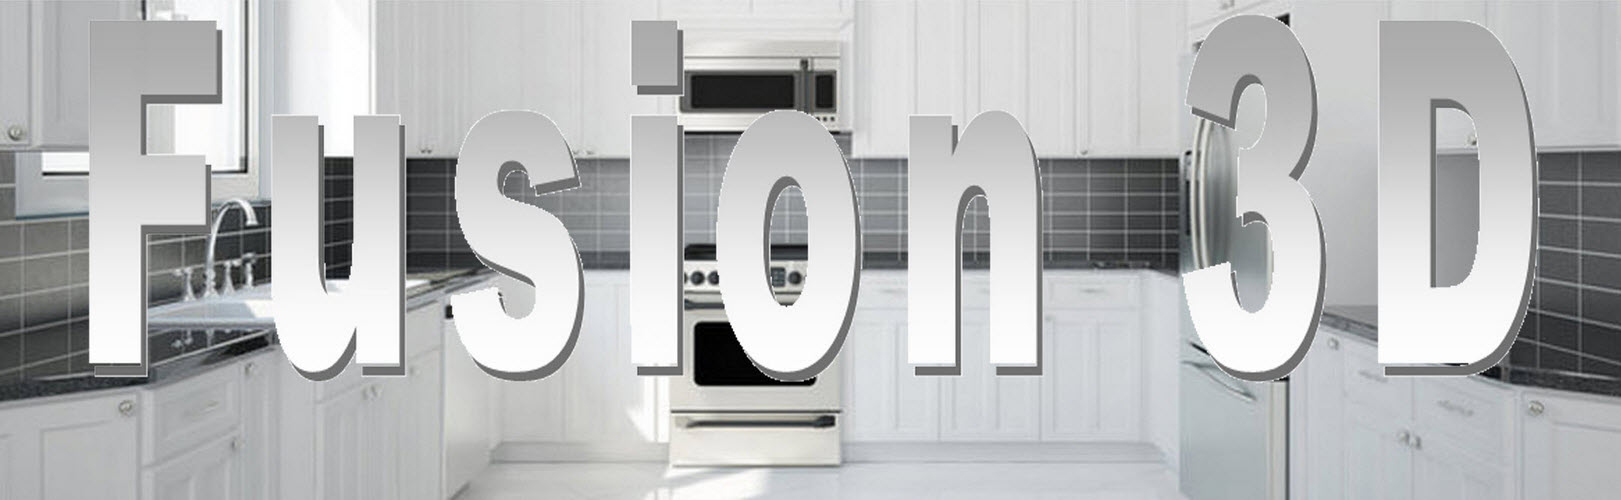 Logiciel de cuisine Fusion 17D / SketchUp